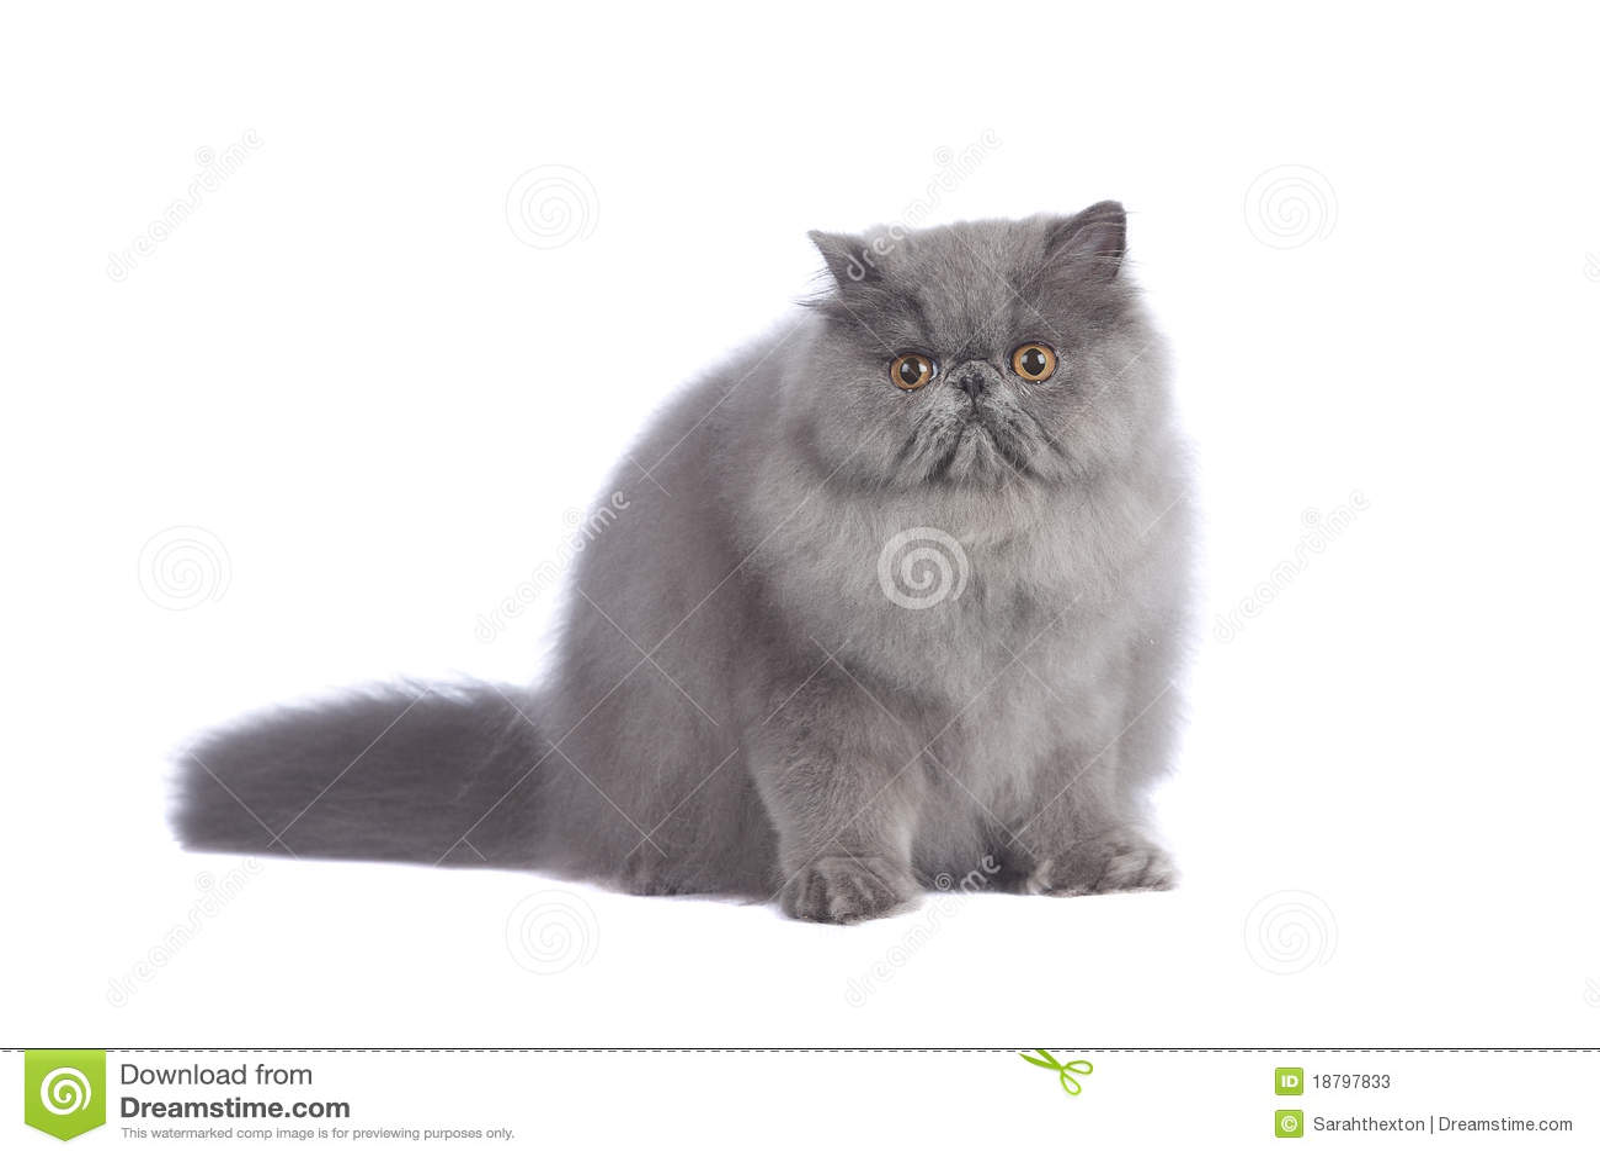 Gato persa azul en estudio